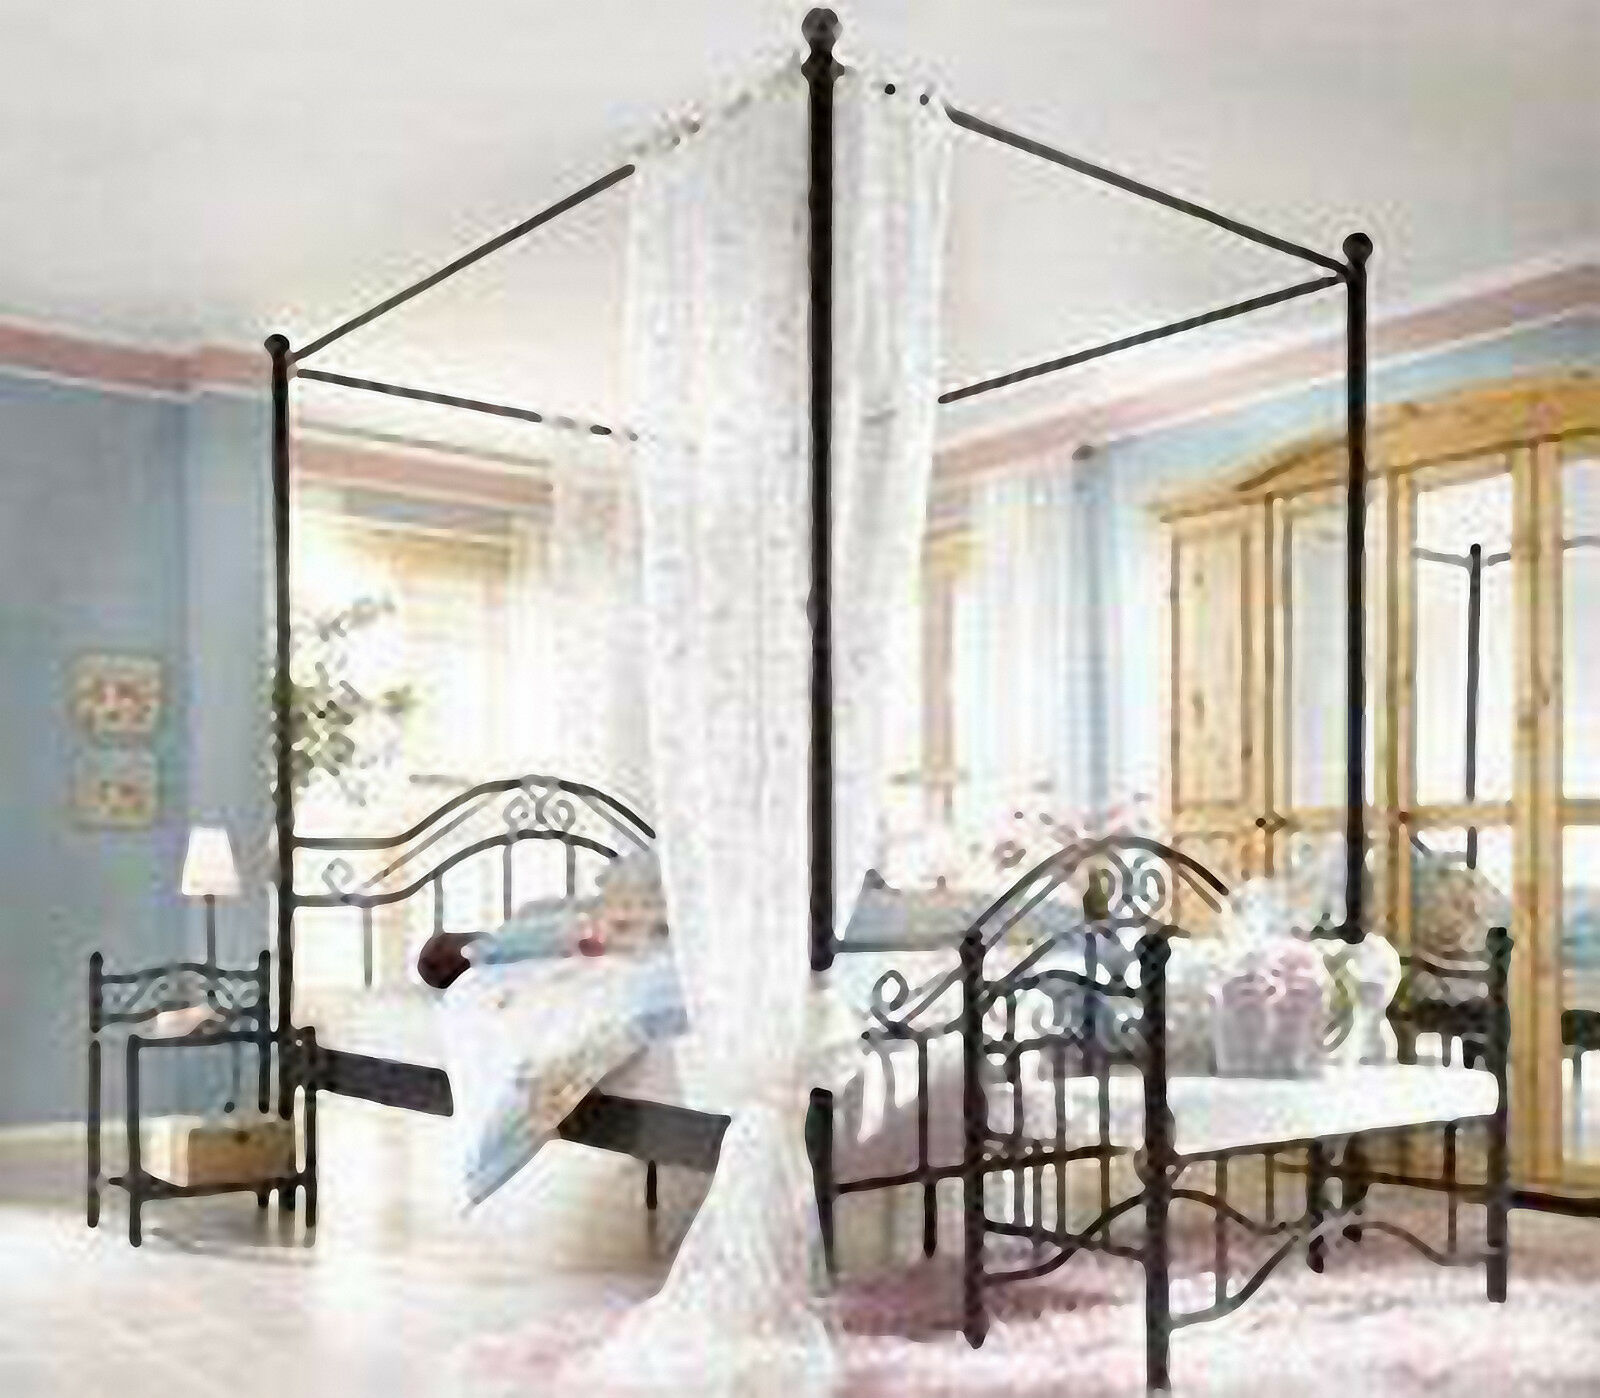 bett schwarz 90x200 affordable bett schwarz 90x200 with bett schwarz 90x200 simple bett x. Black Bedroom Furniture Sets. Home Design Ideas